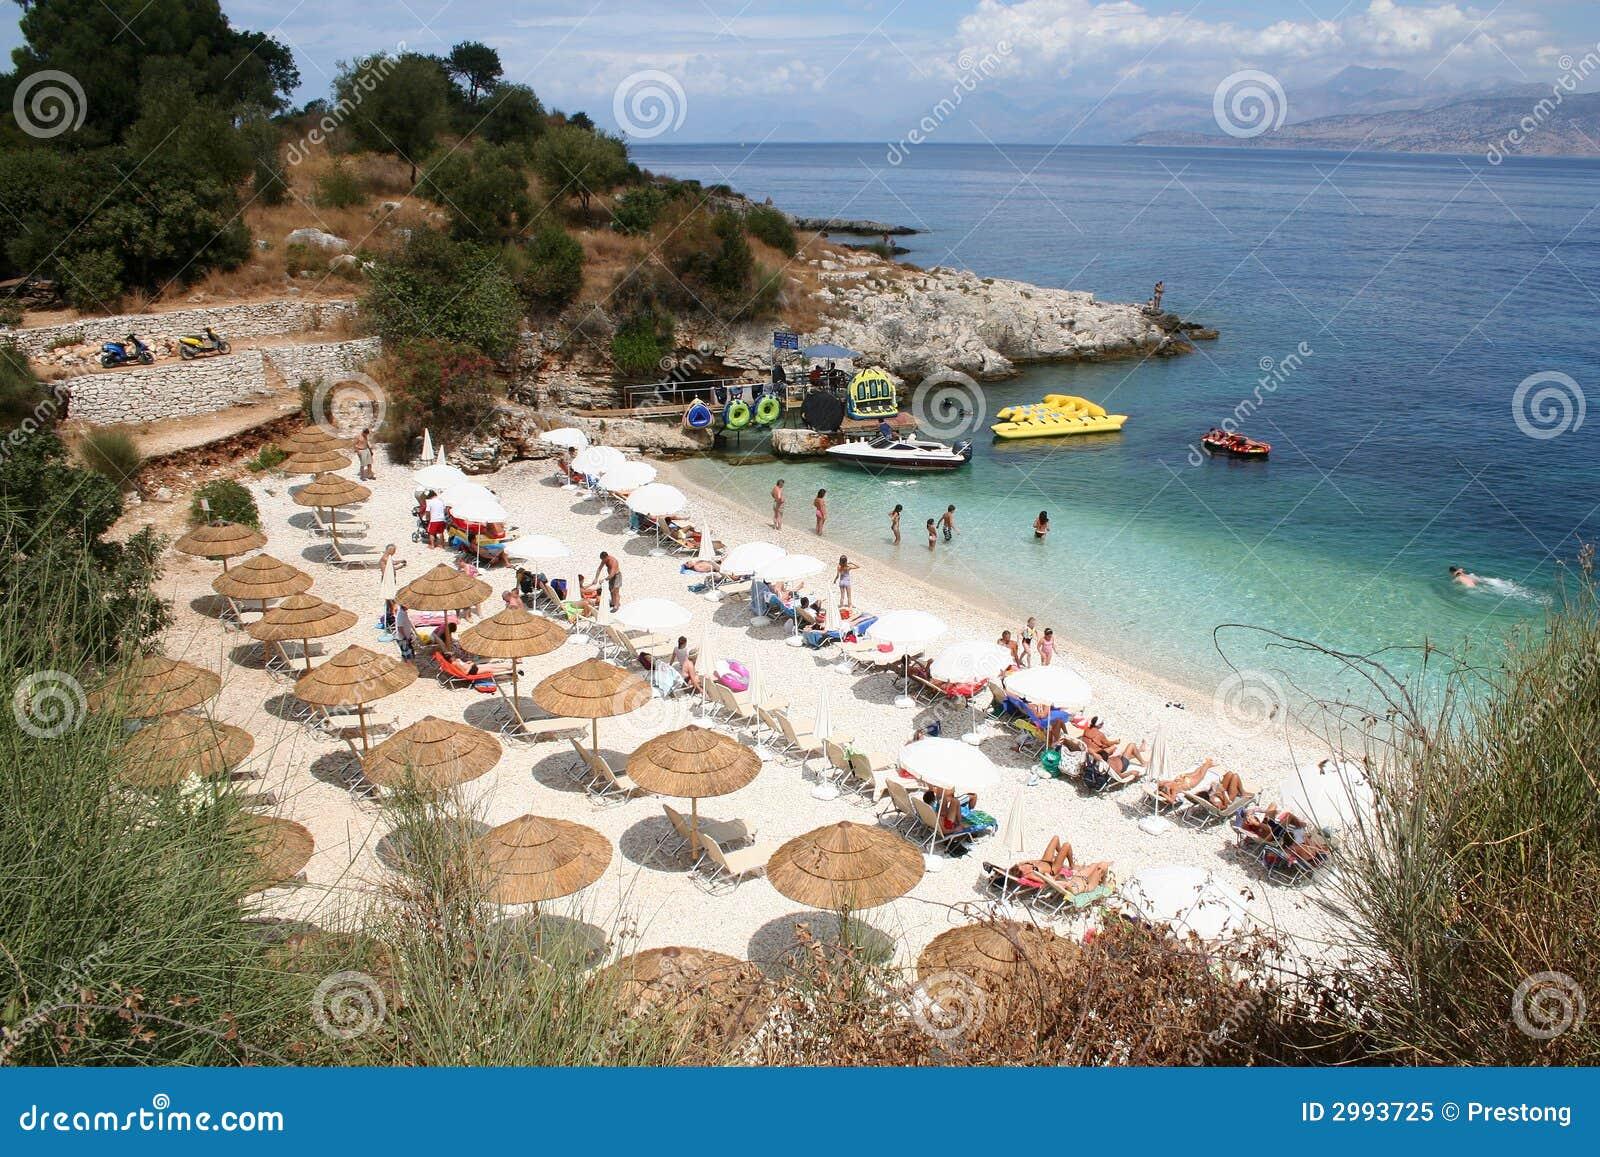 Kassiopi Beach, Corfu, Greece.